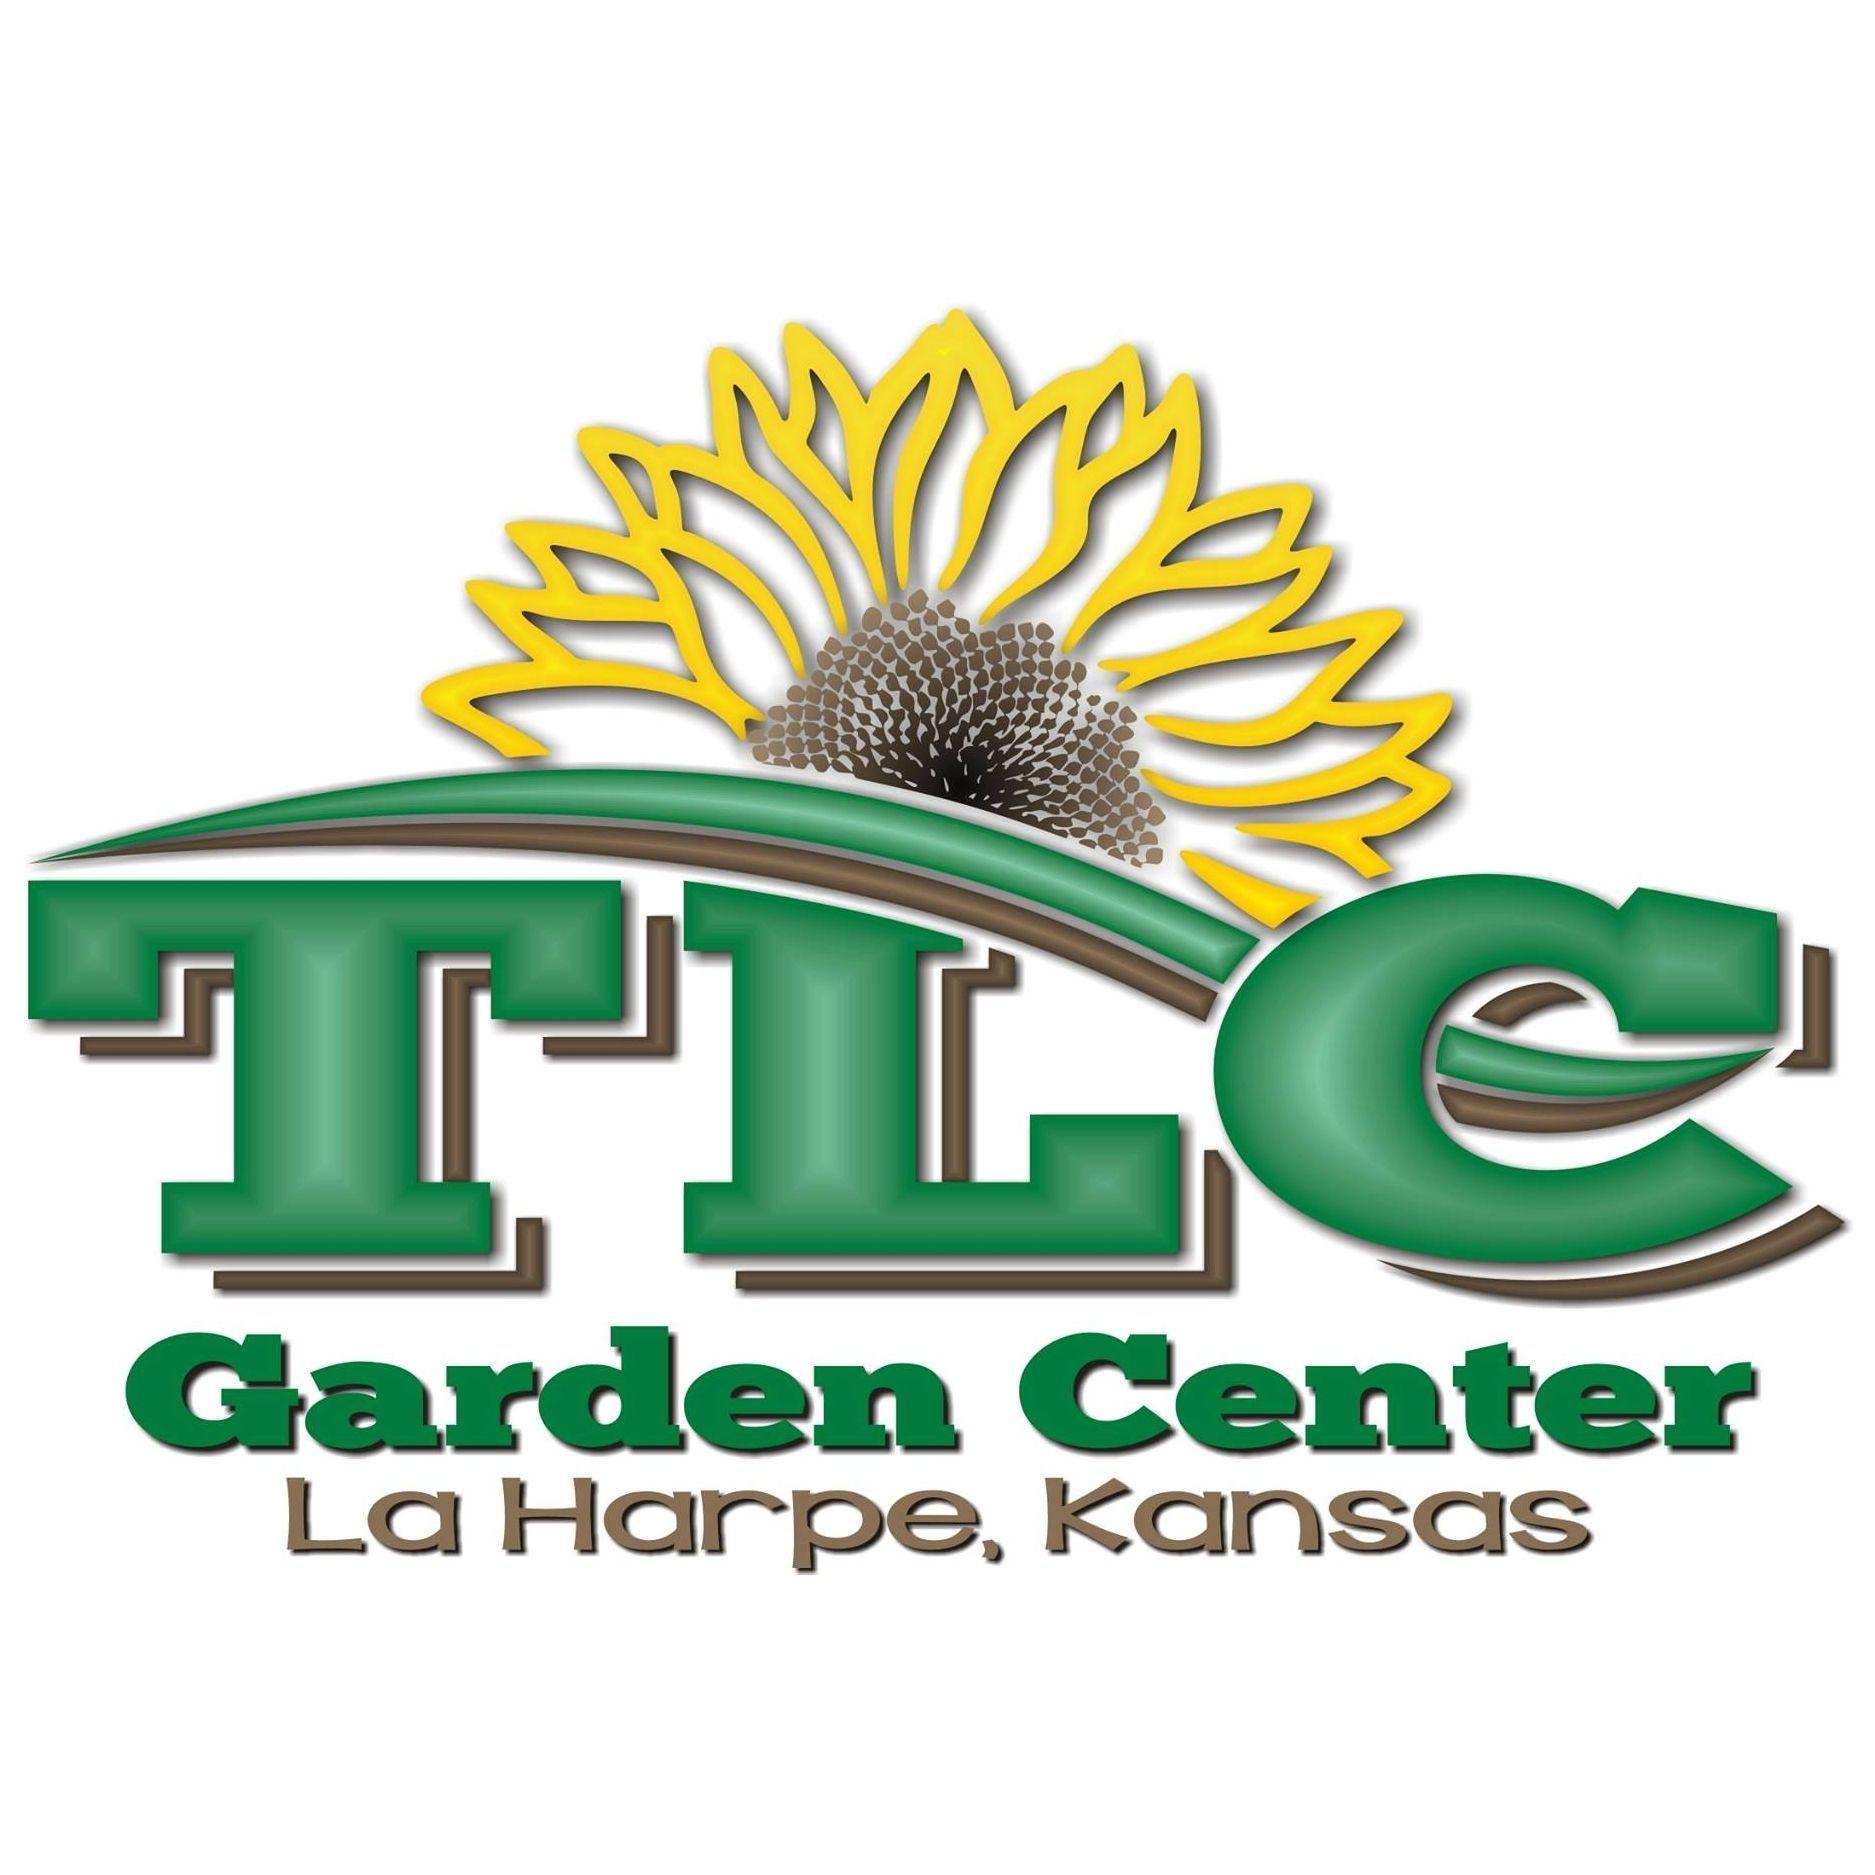 TLC Garden Center